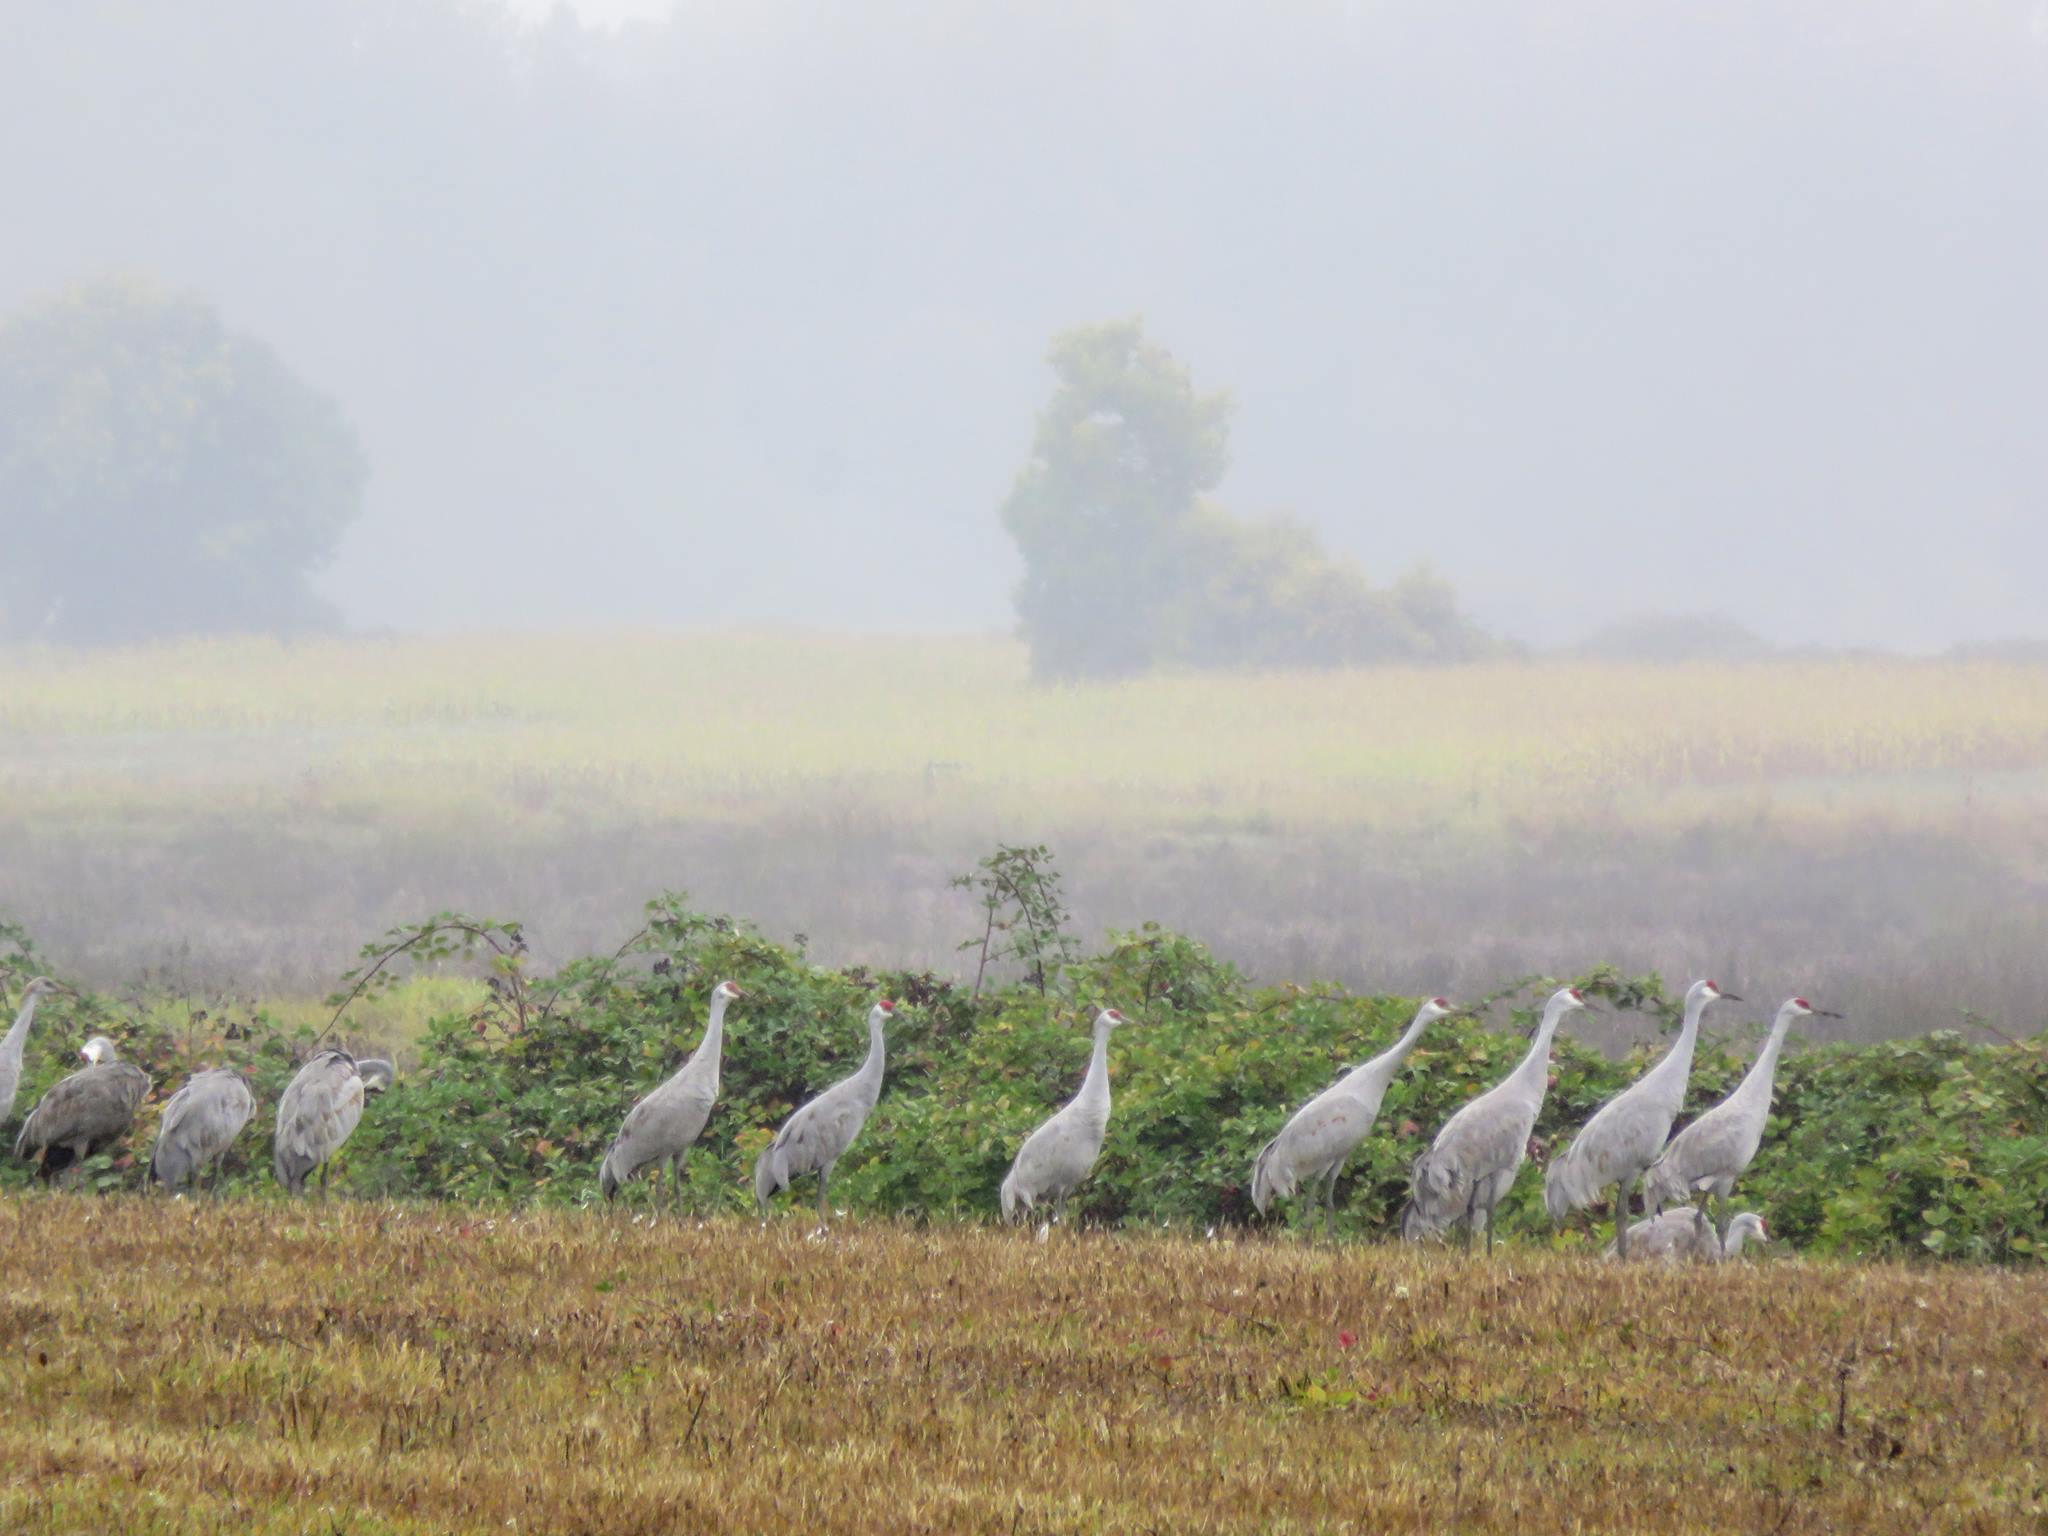 Sand hill cranes on Sauvie Island, photo by Jennifer